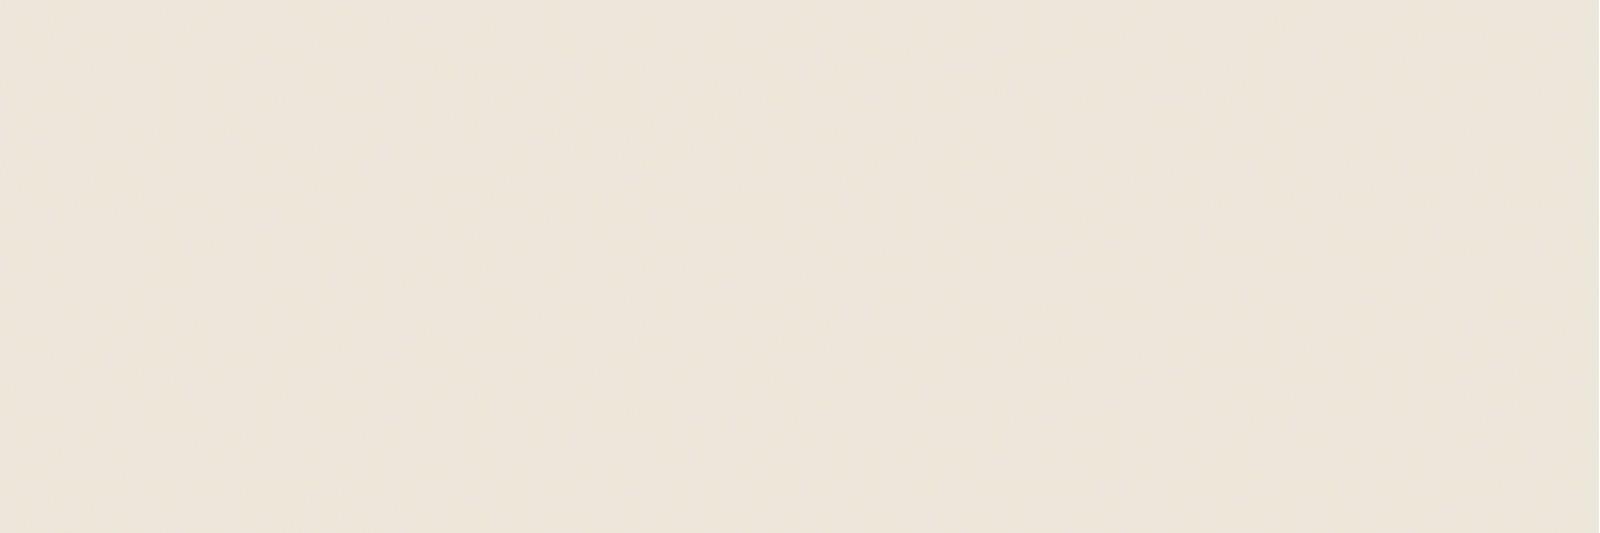 Стенни плочки Colorplay Cream 30x90